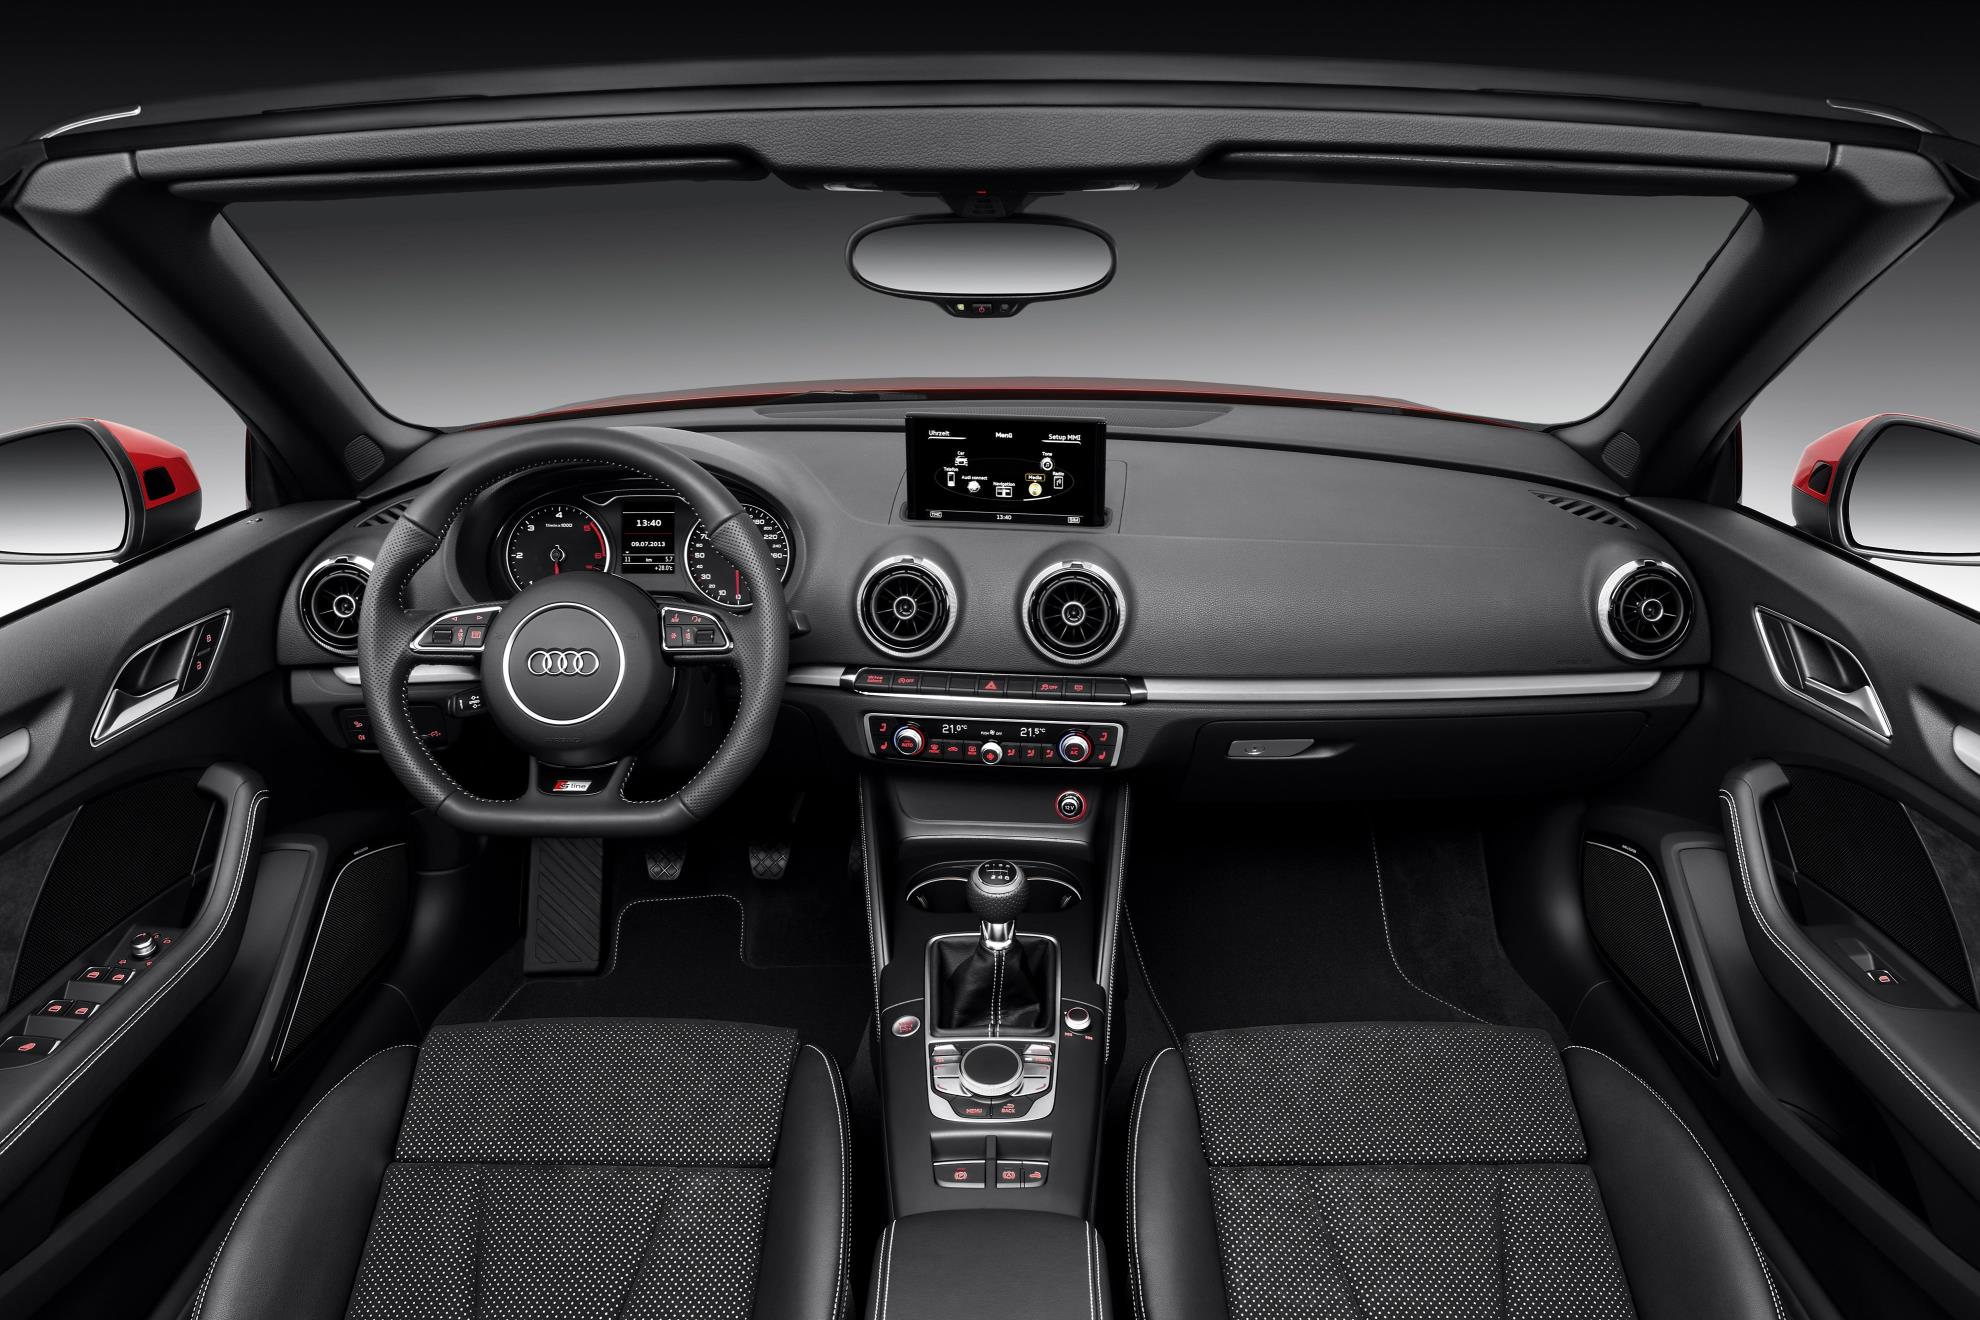 US-spec 2017 Audi S3 Sedan Review Highlights Virtual Cockpit, New Design - autoevolution